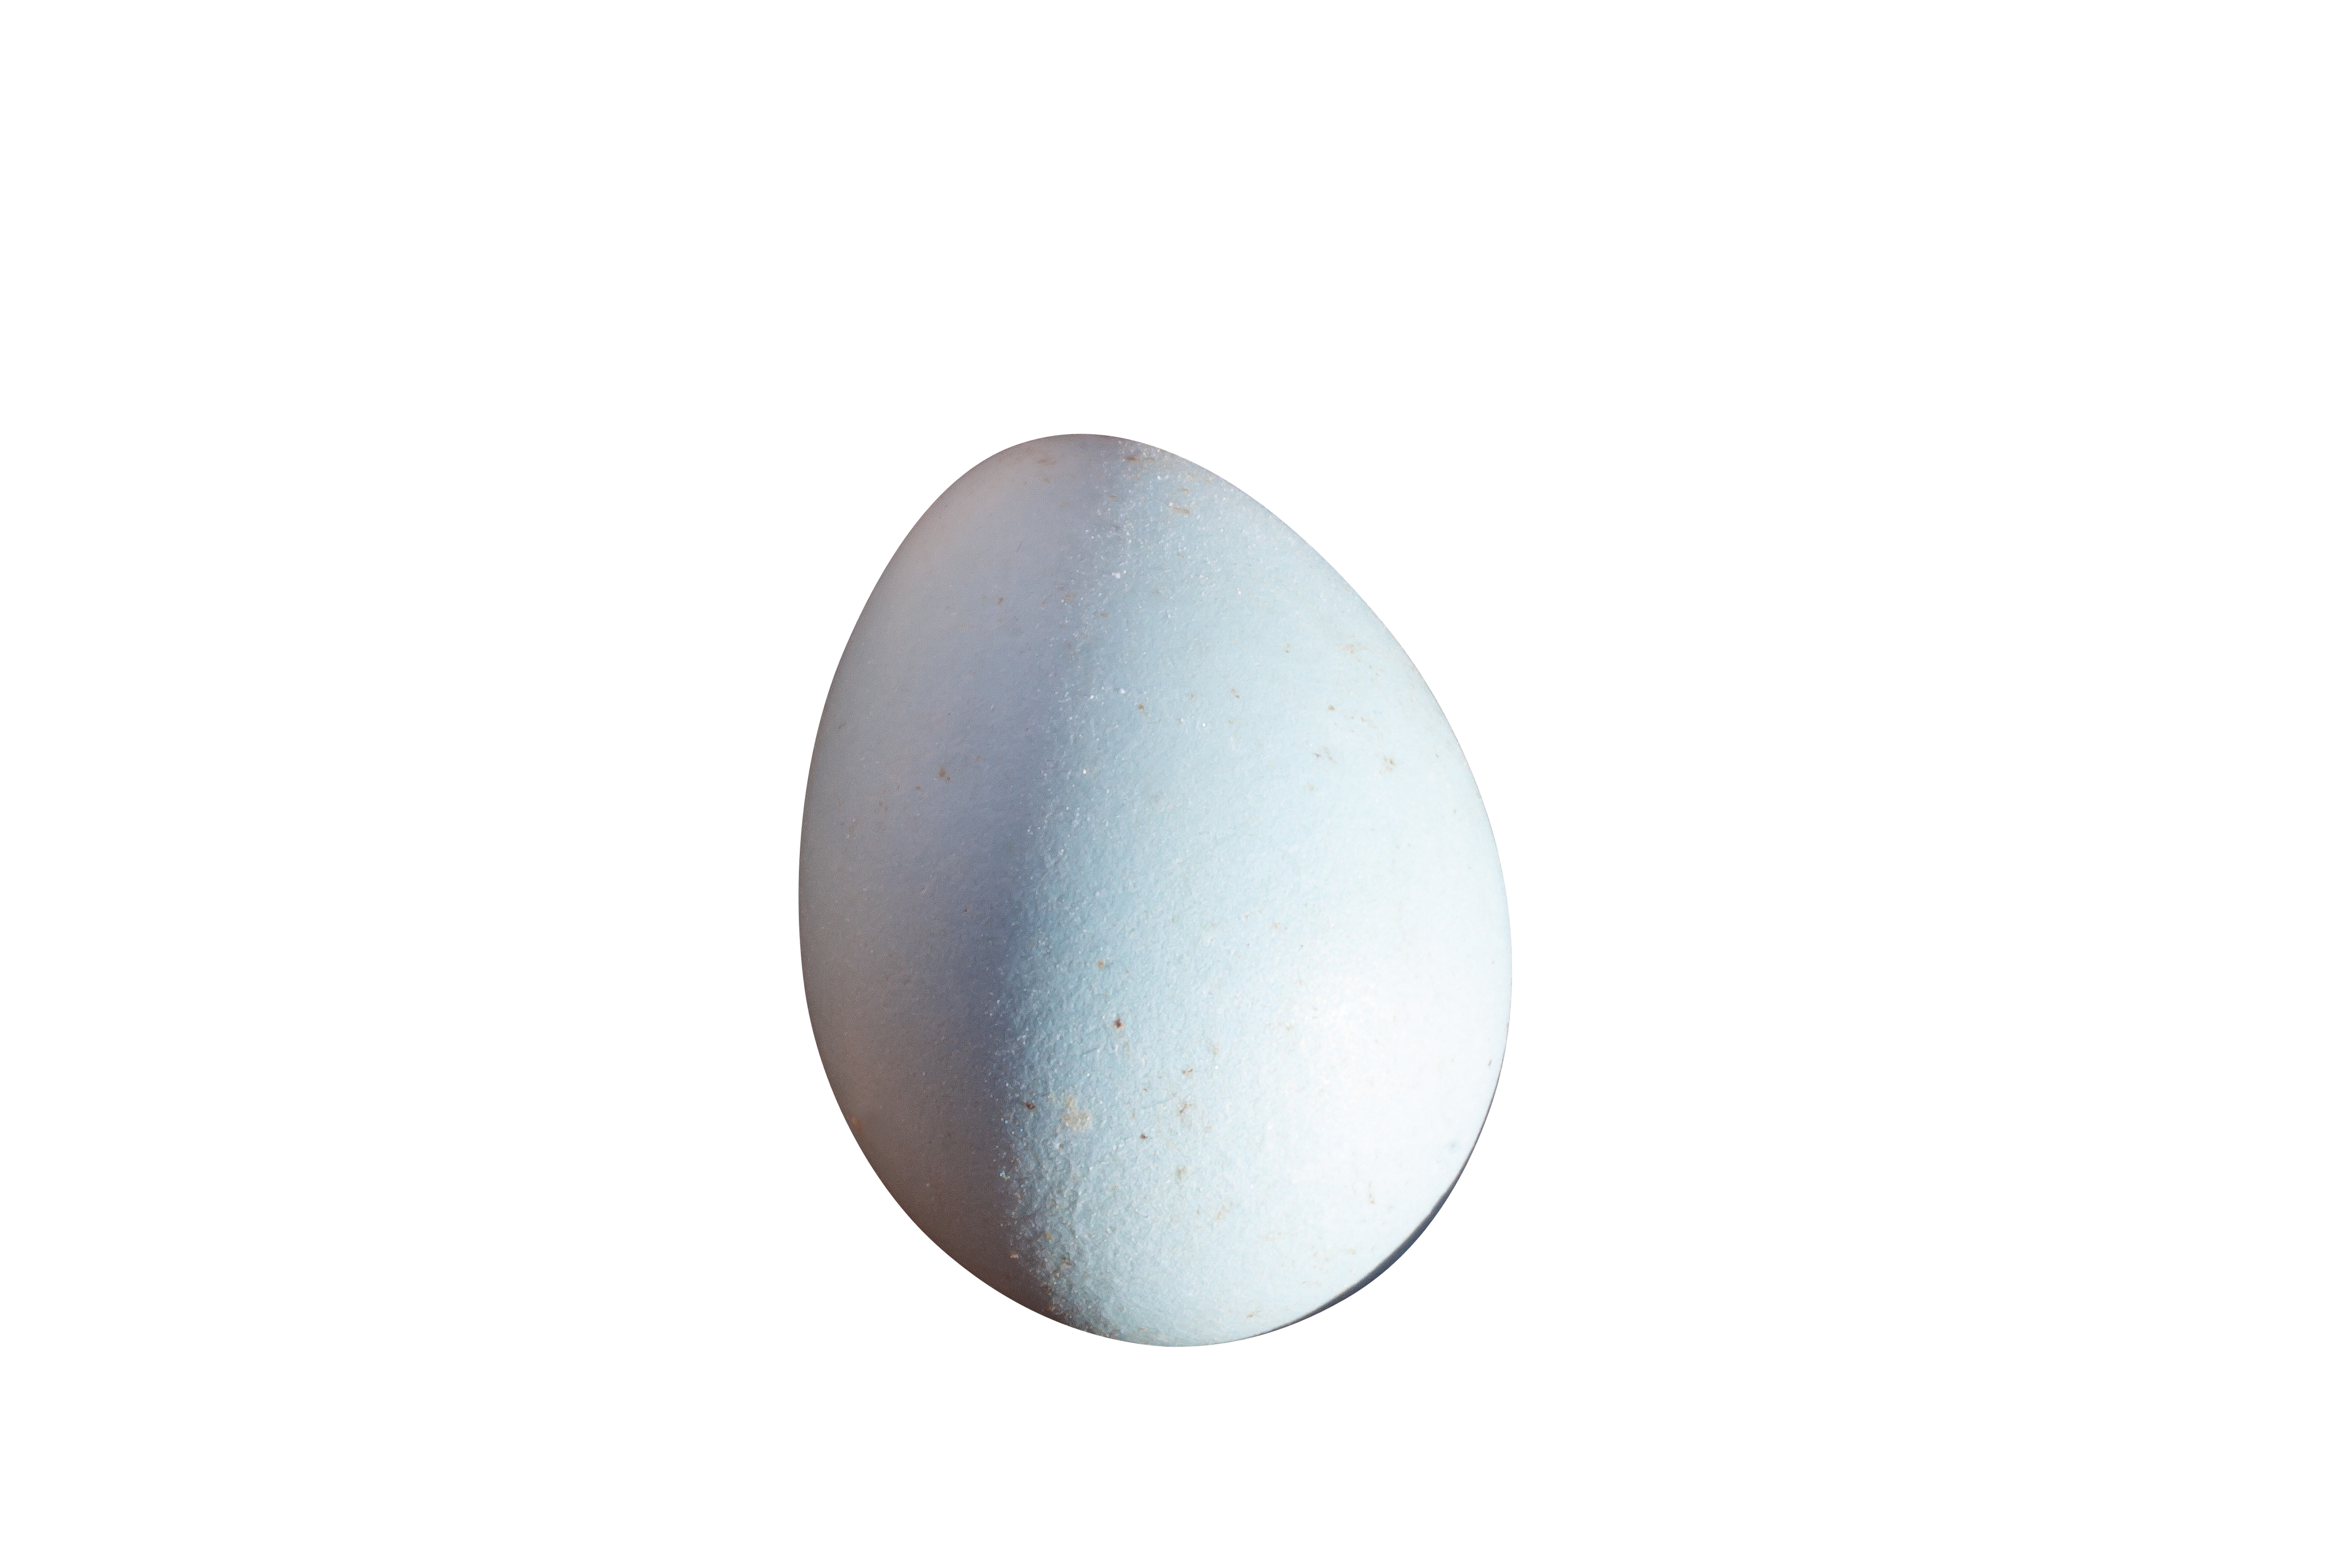 egg-1151755_Clip